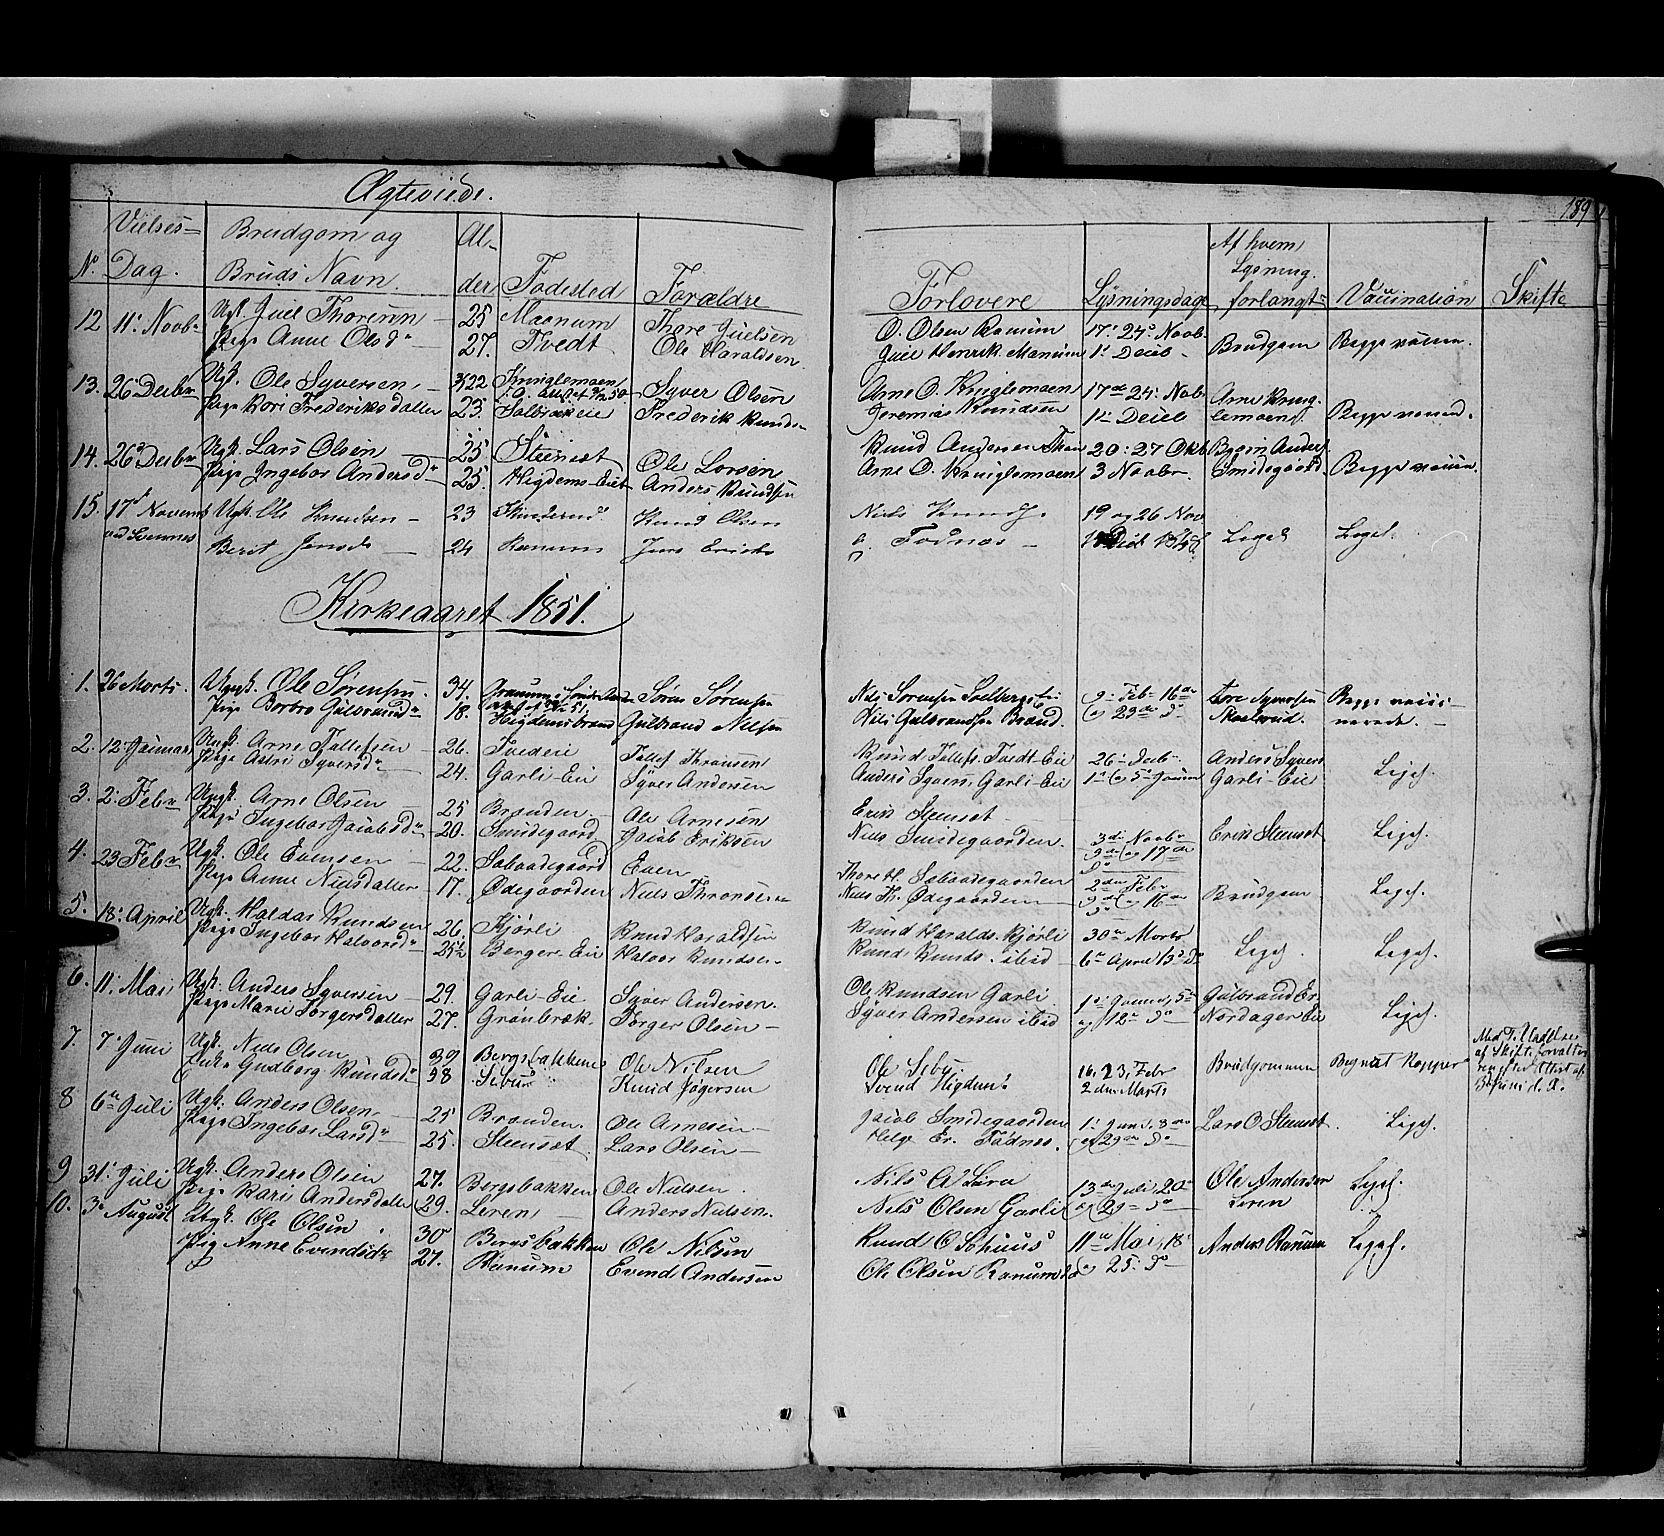 SAH, Nord-Aurdal prestekontor, Ministerialbok nr. 7, 1842-1863, s. 189